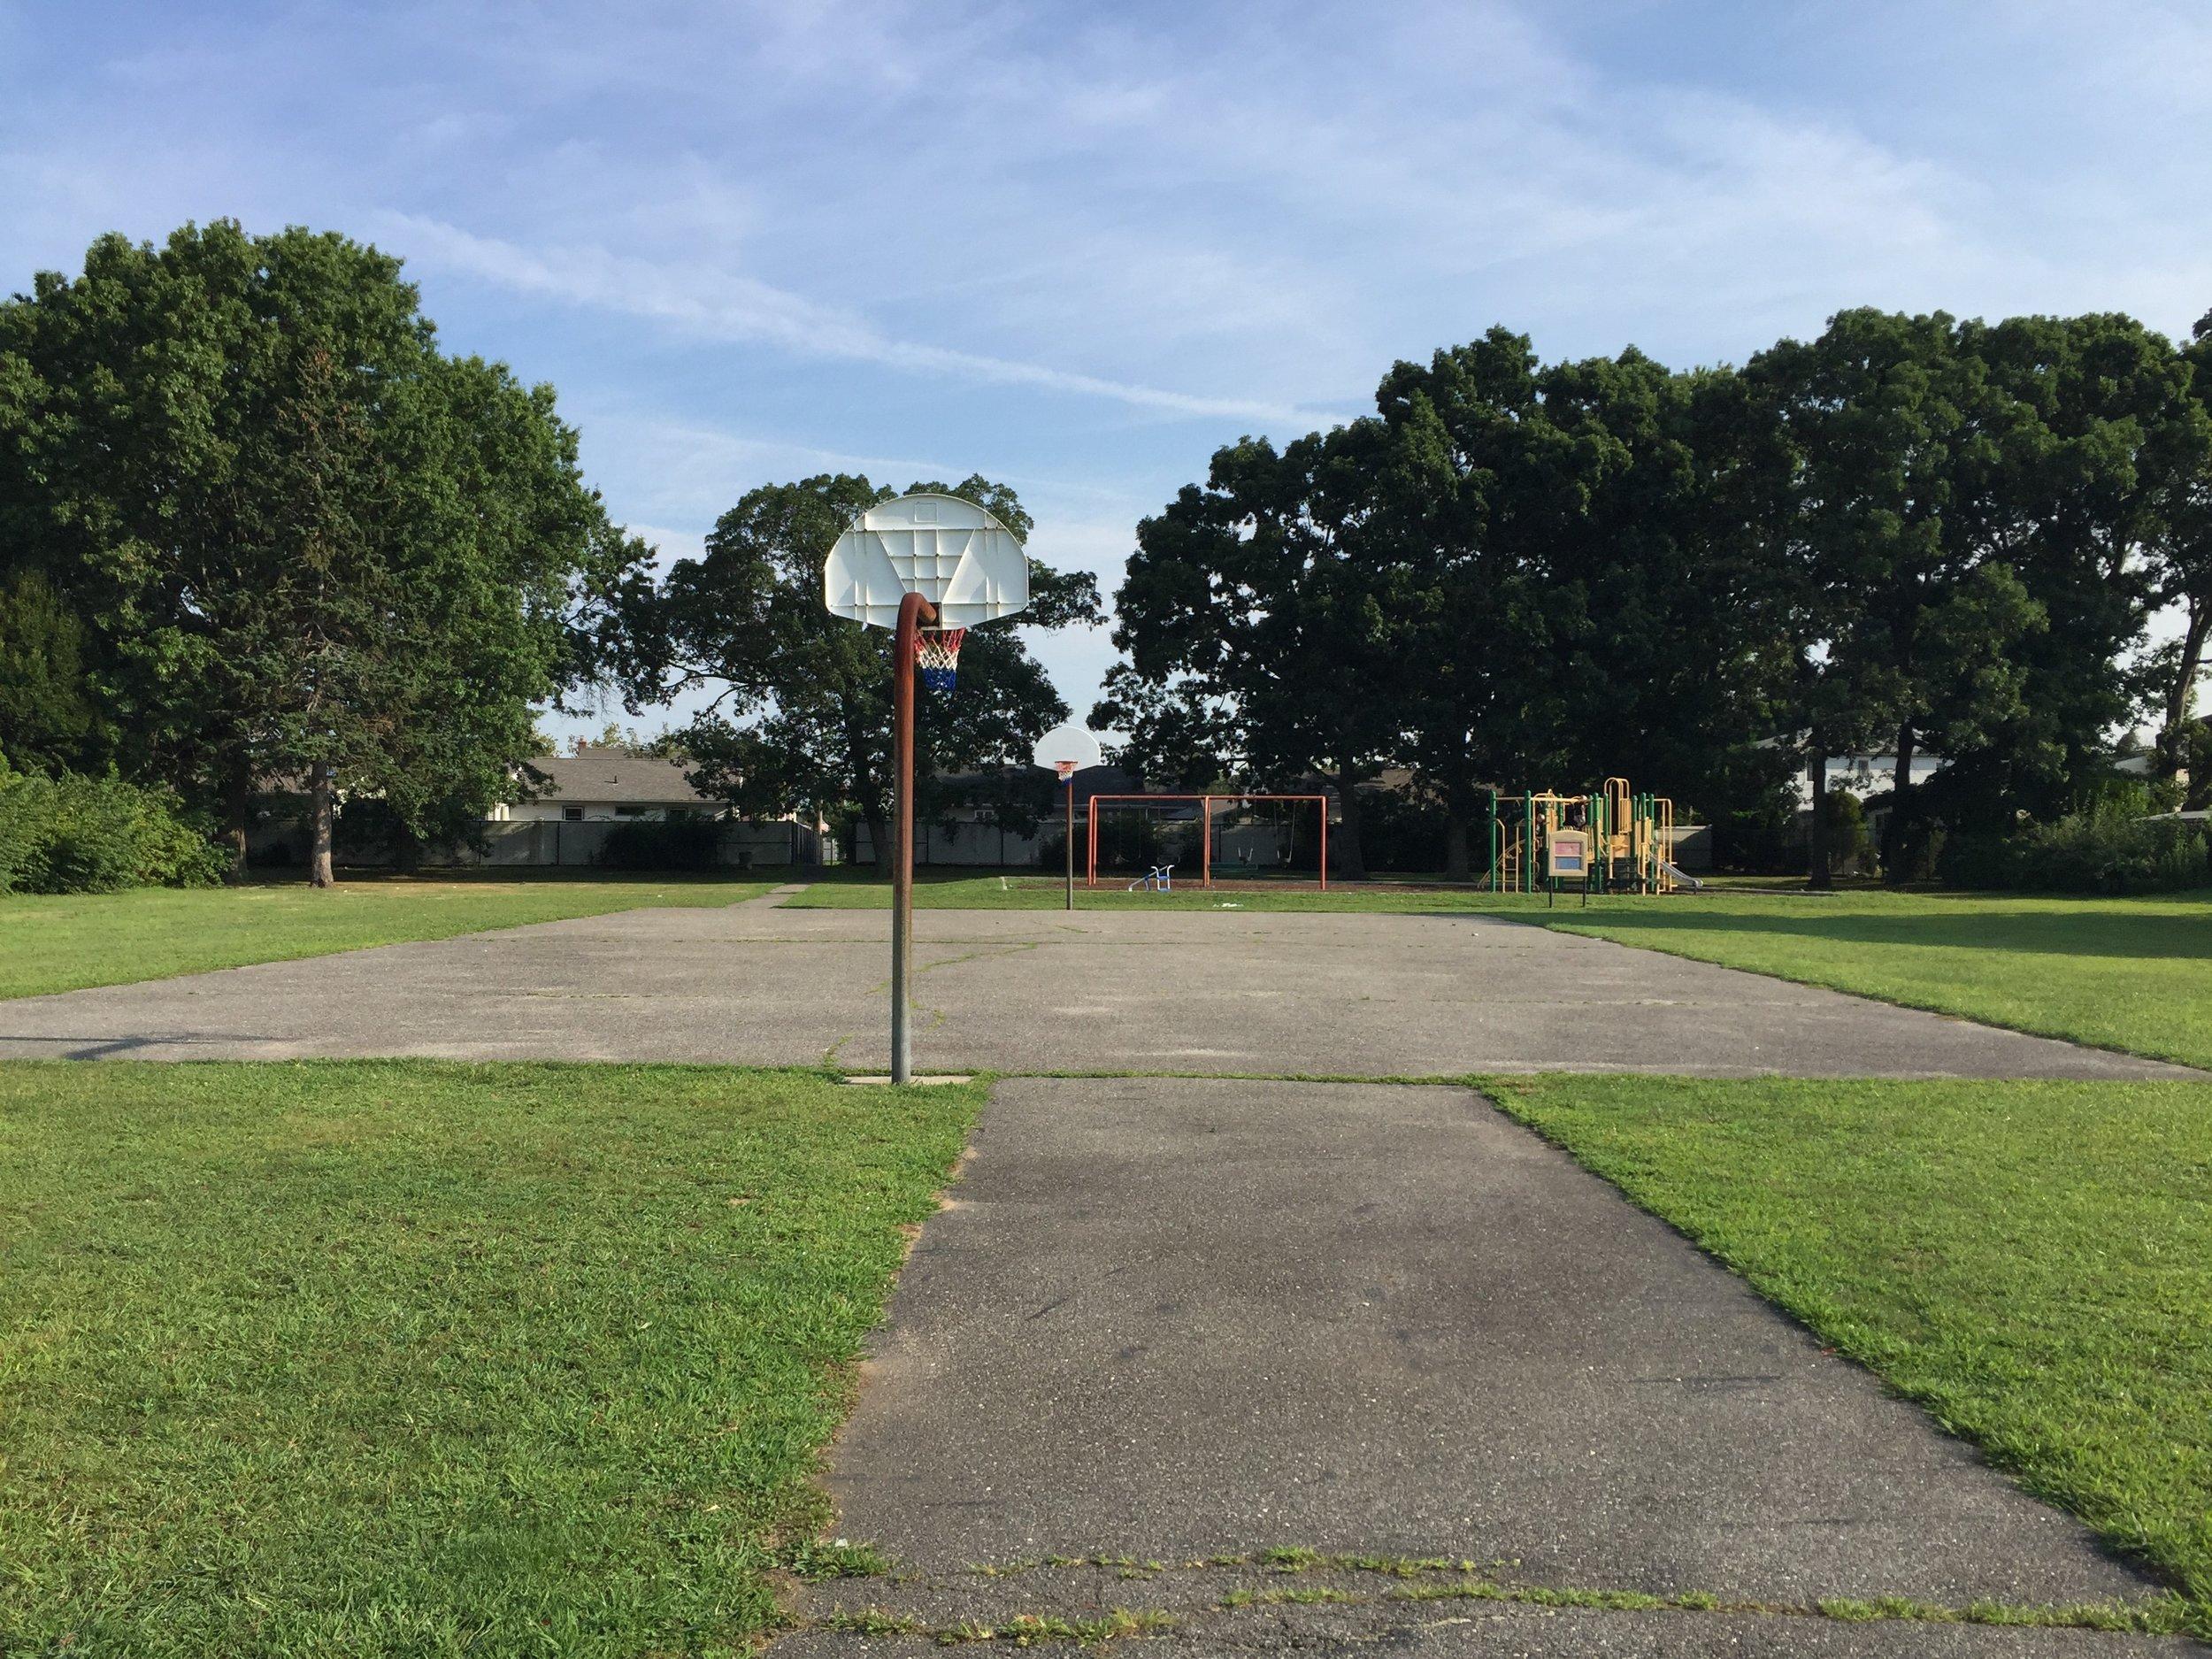 North Oaks Basketball Court